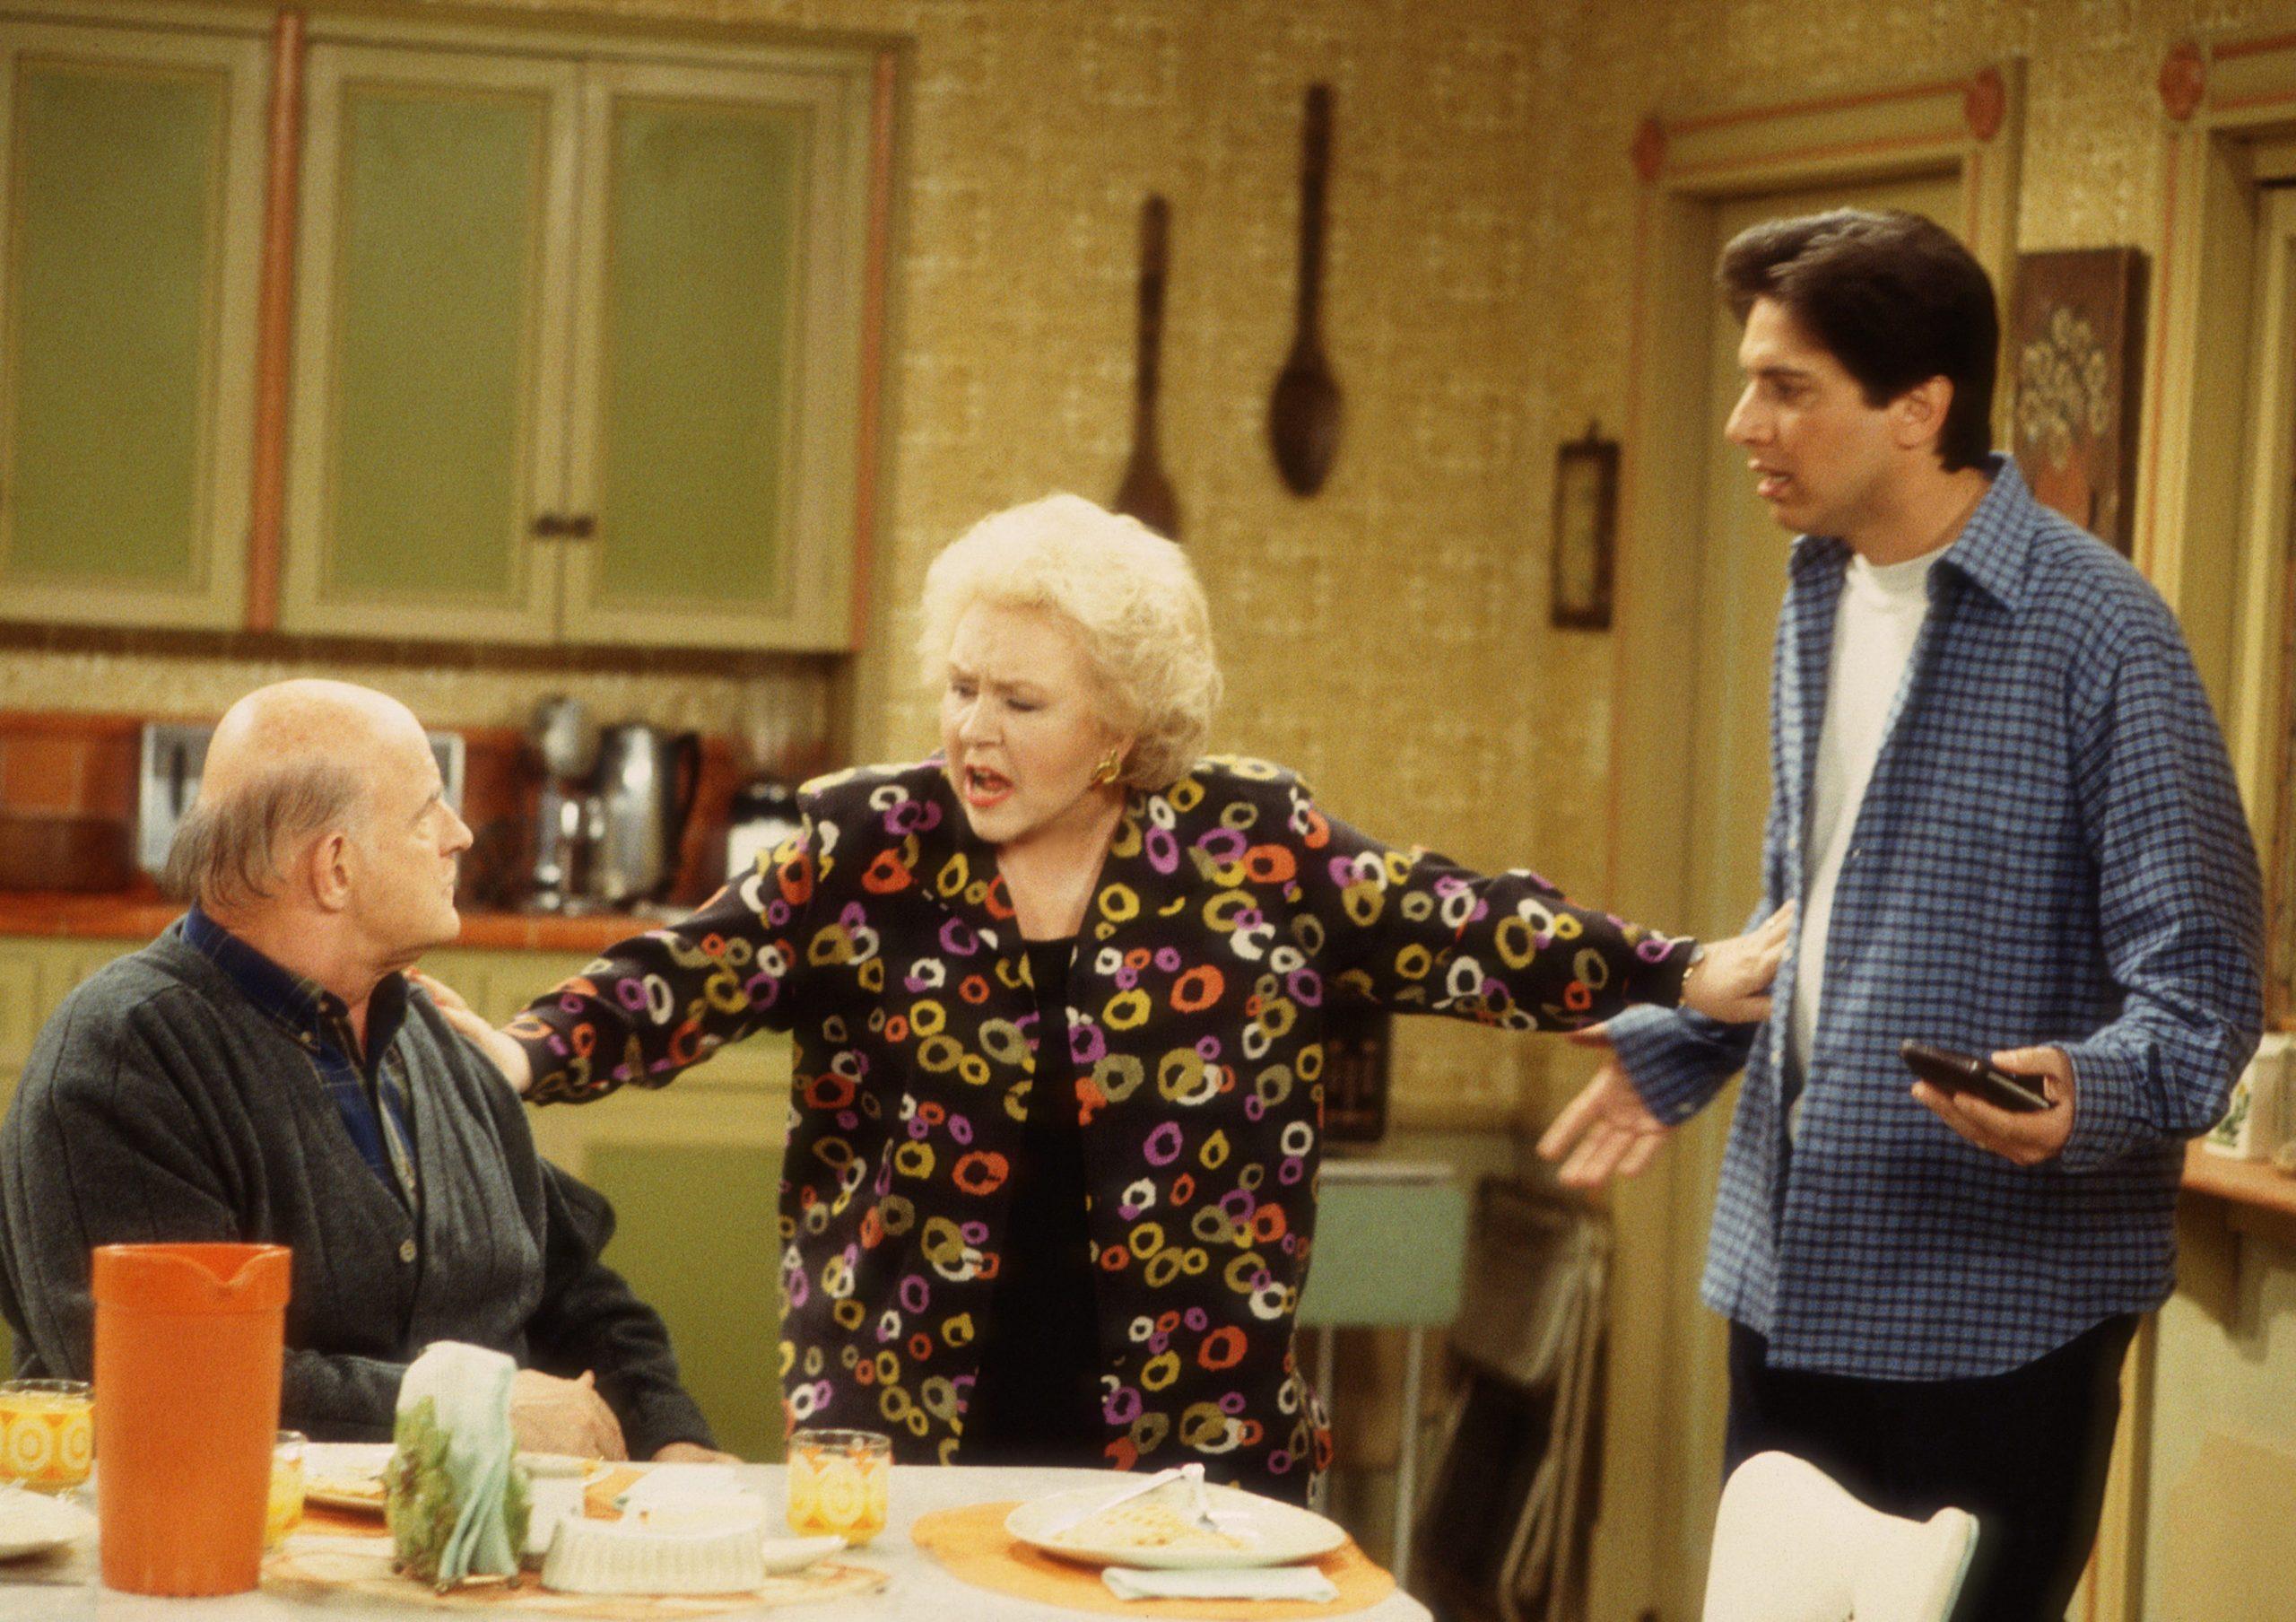 A scene from 'Everybody Loves Raymond'